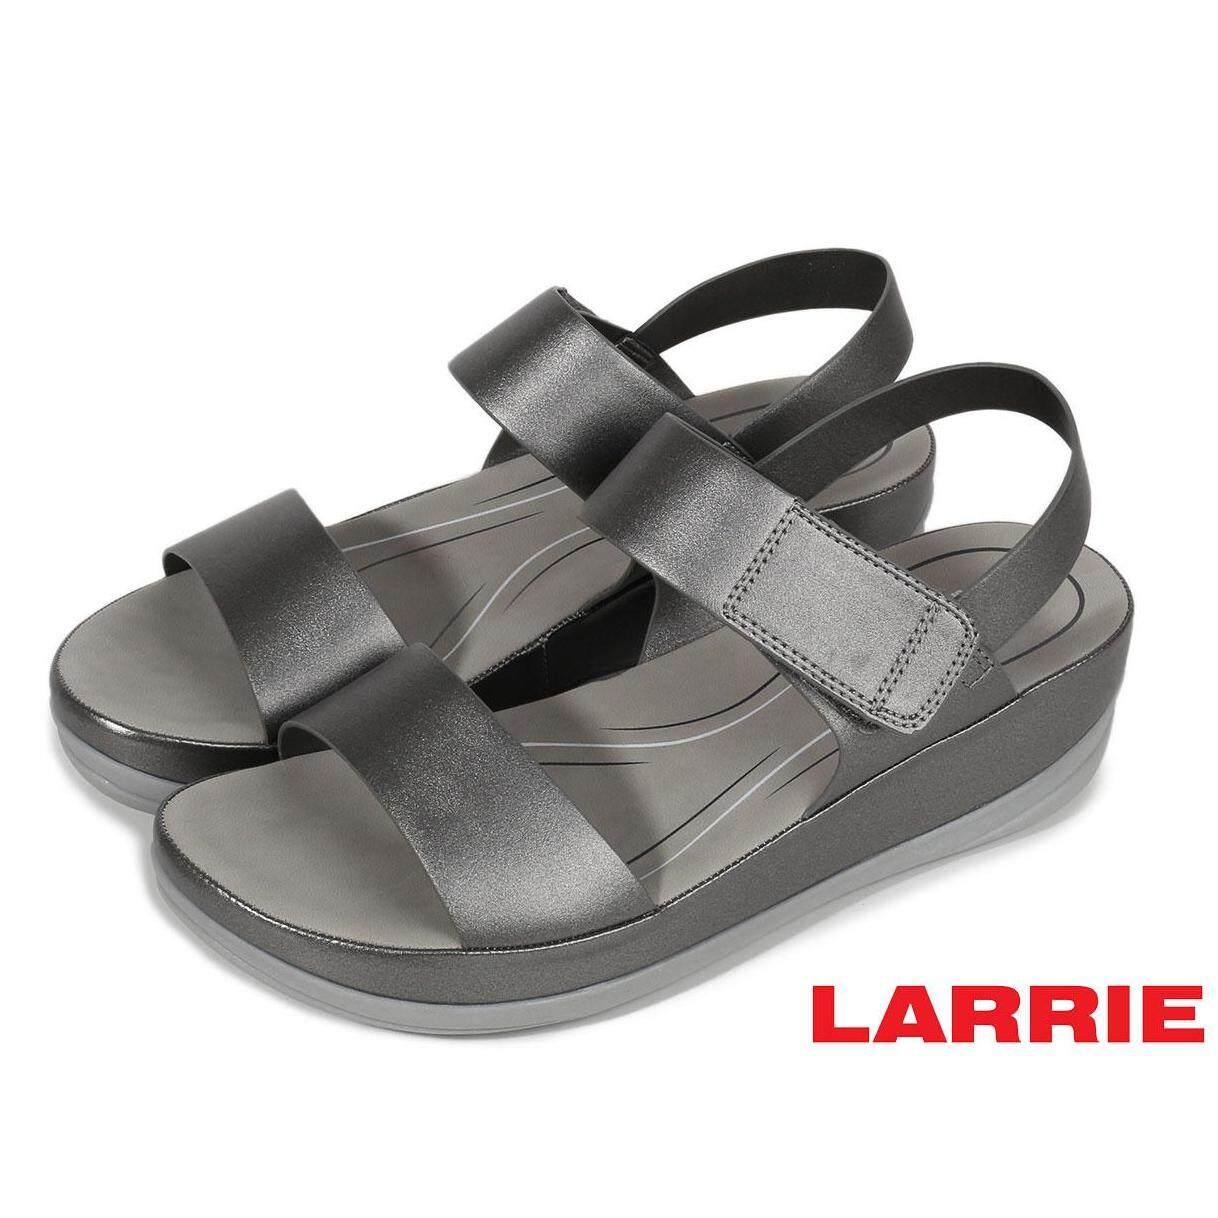 LARRIE Kasut Perempuan Velcro Strap Secure Sandal Wanita - L81912-CV01SV